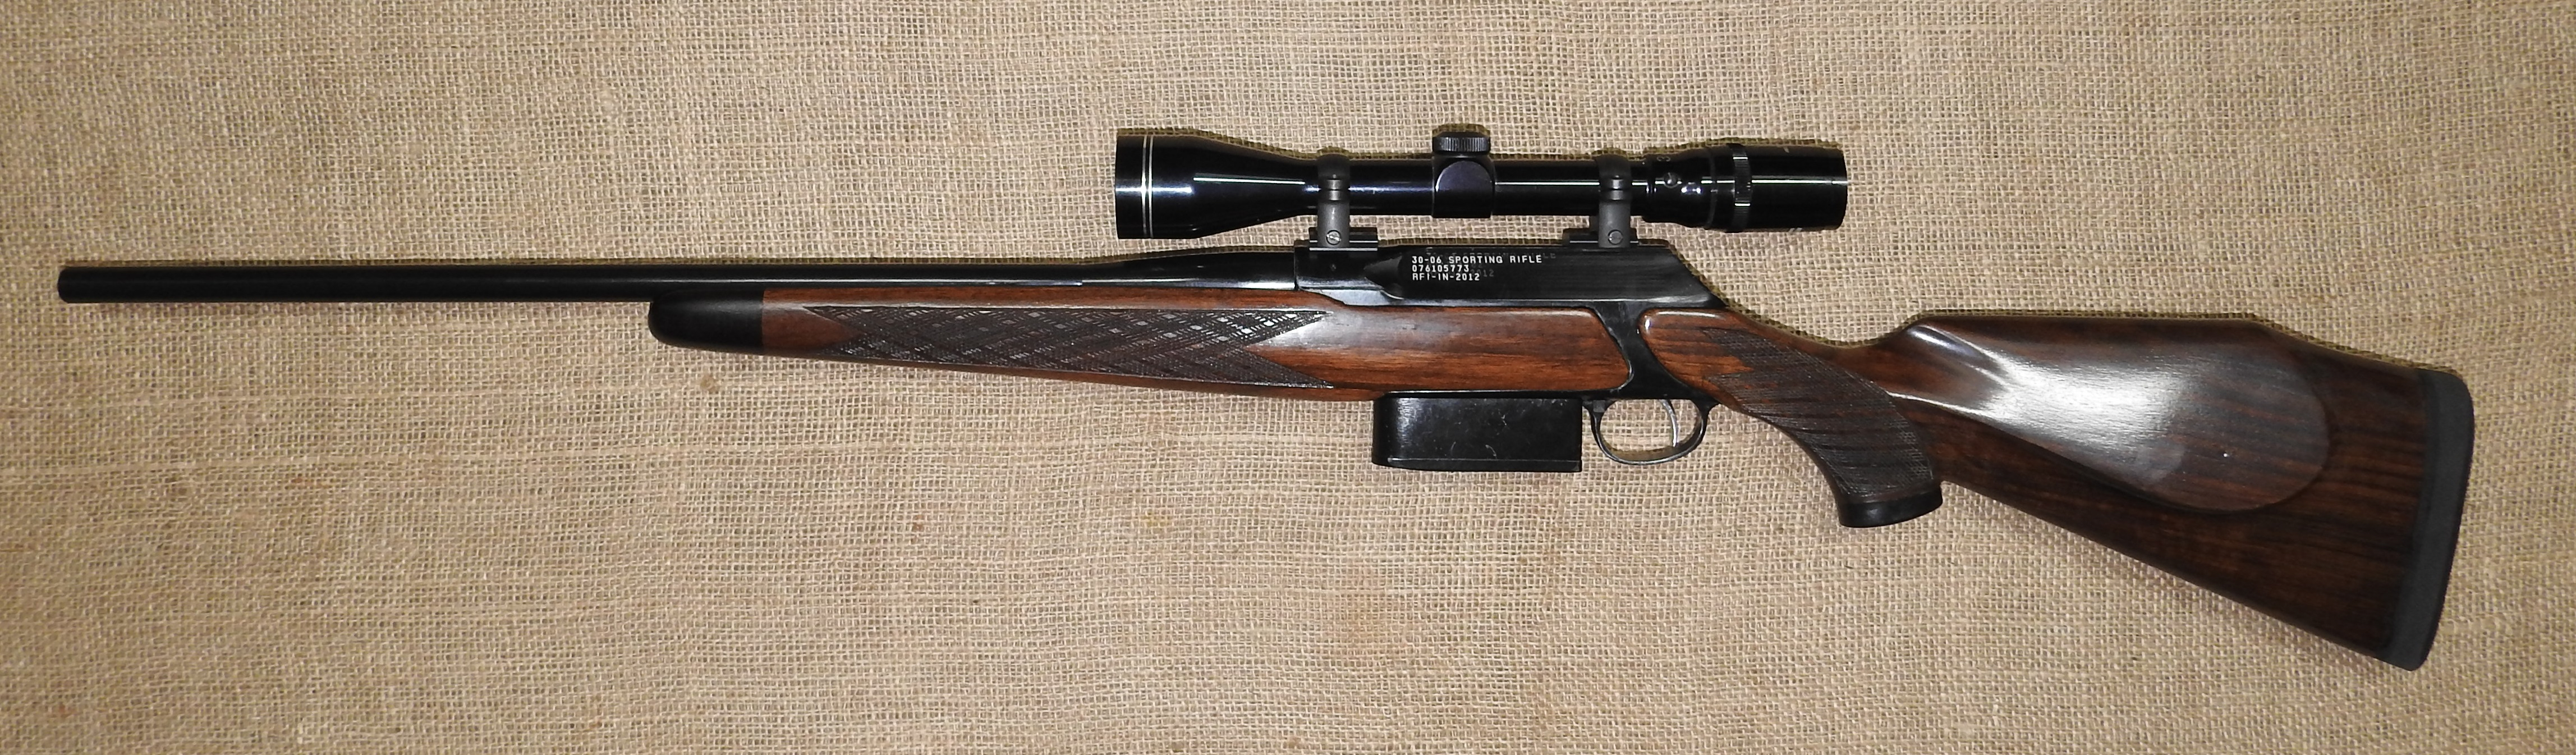 Iof 30 06 Sporting Rifle Guns Amp Tackle